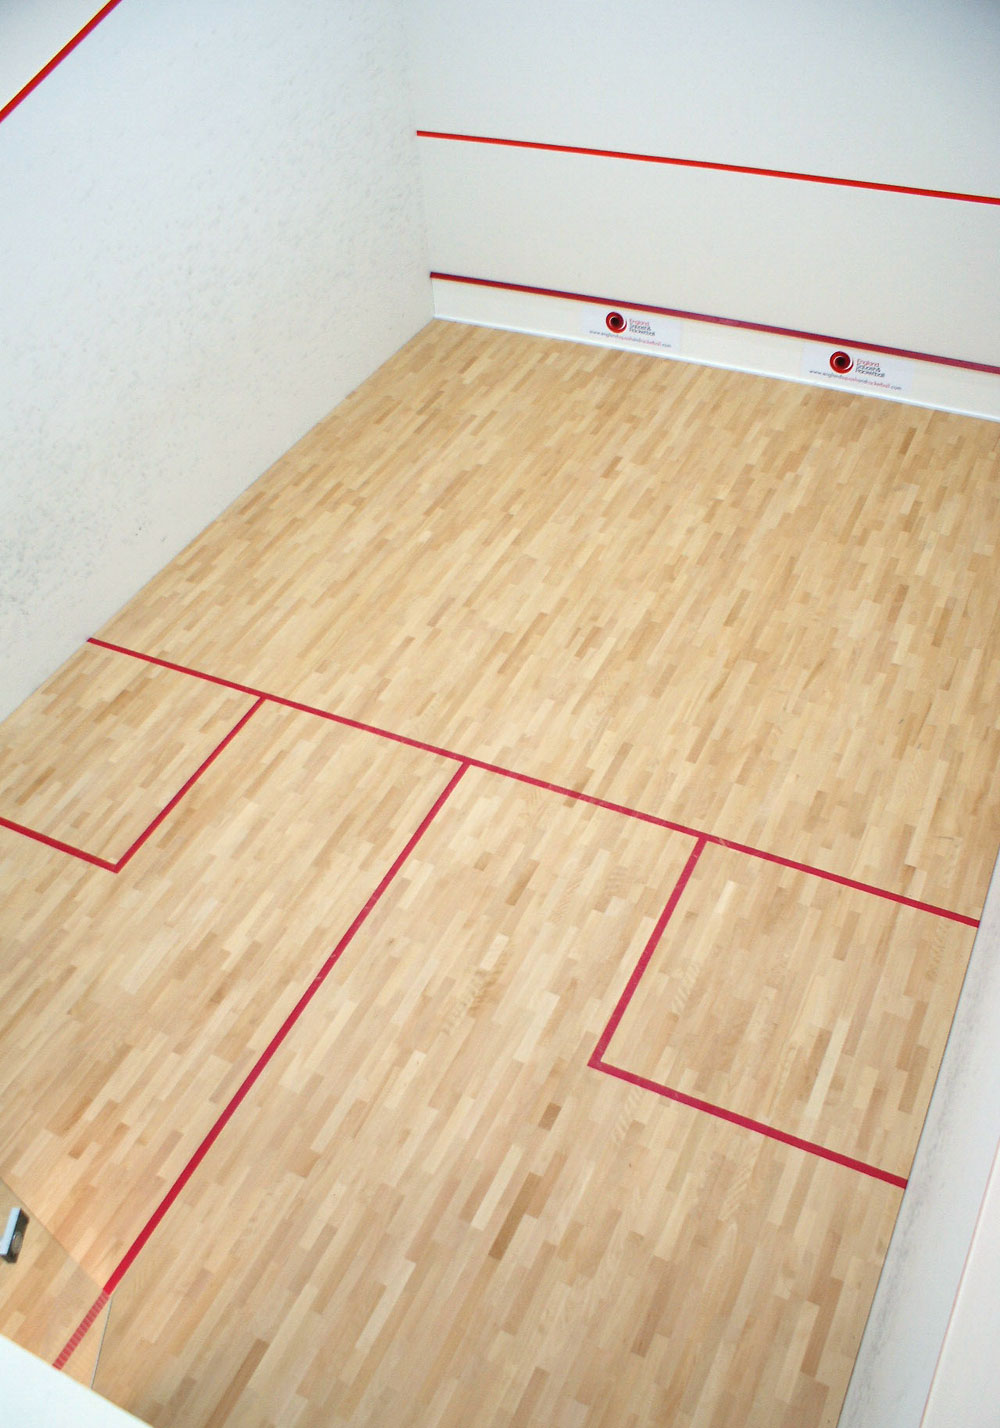 Squash Court Cleaning Squash Court Maintenance Squash